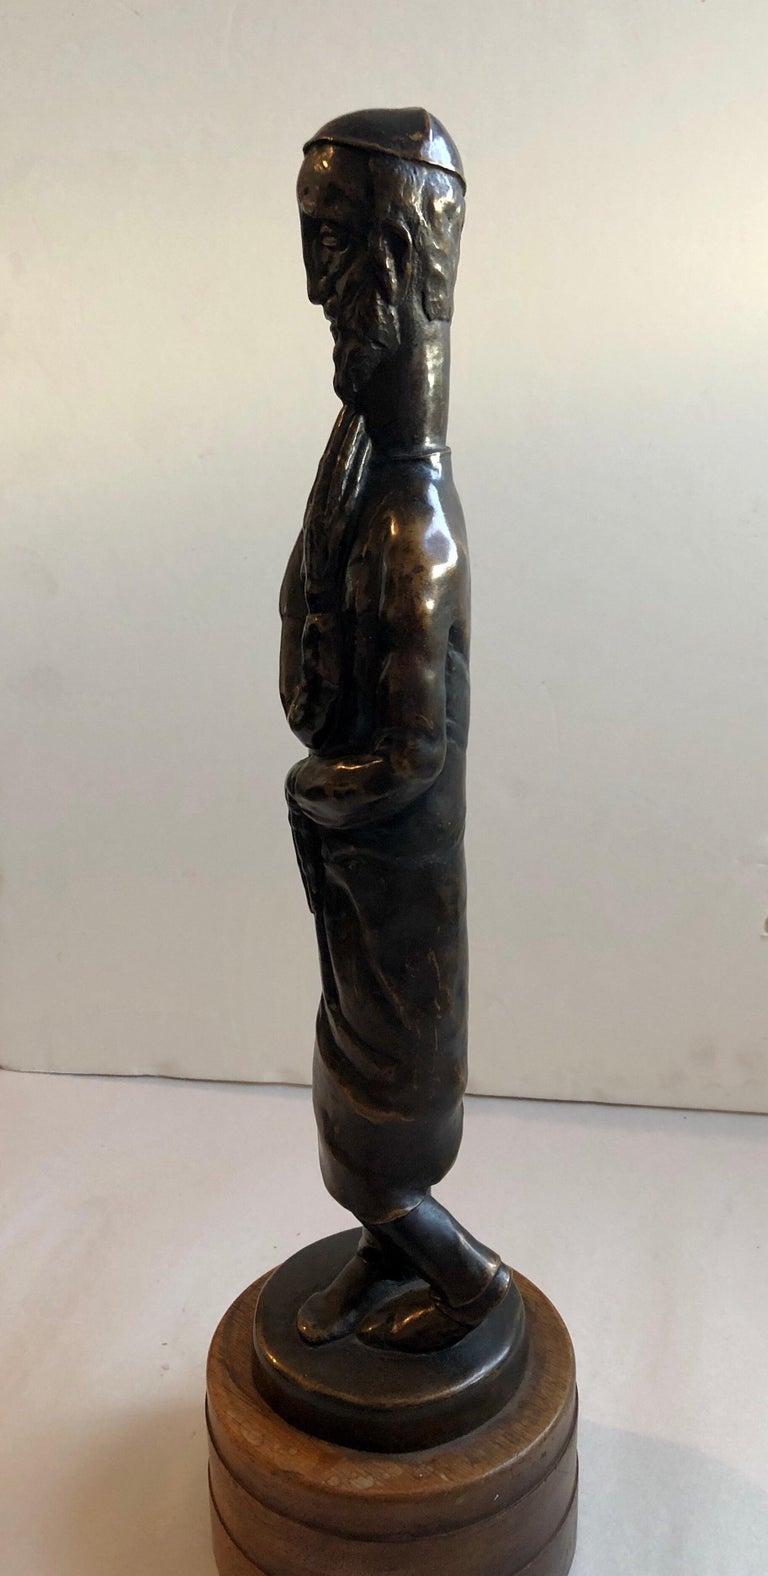 Art Deco Expressionist Bronze Judaica Rabbi Sculpture Los Angeles Modernist For Sale 6